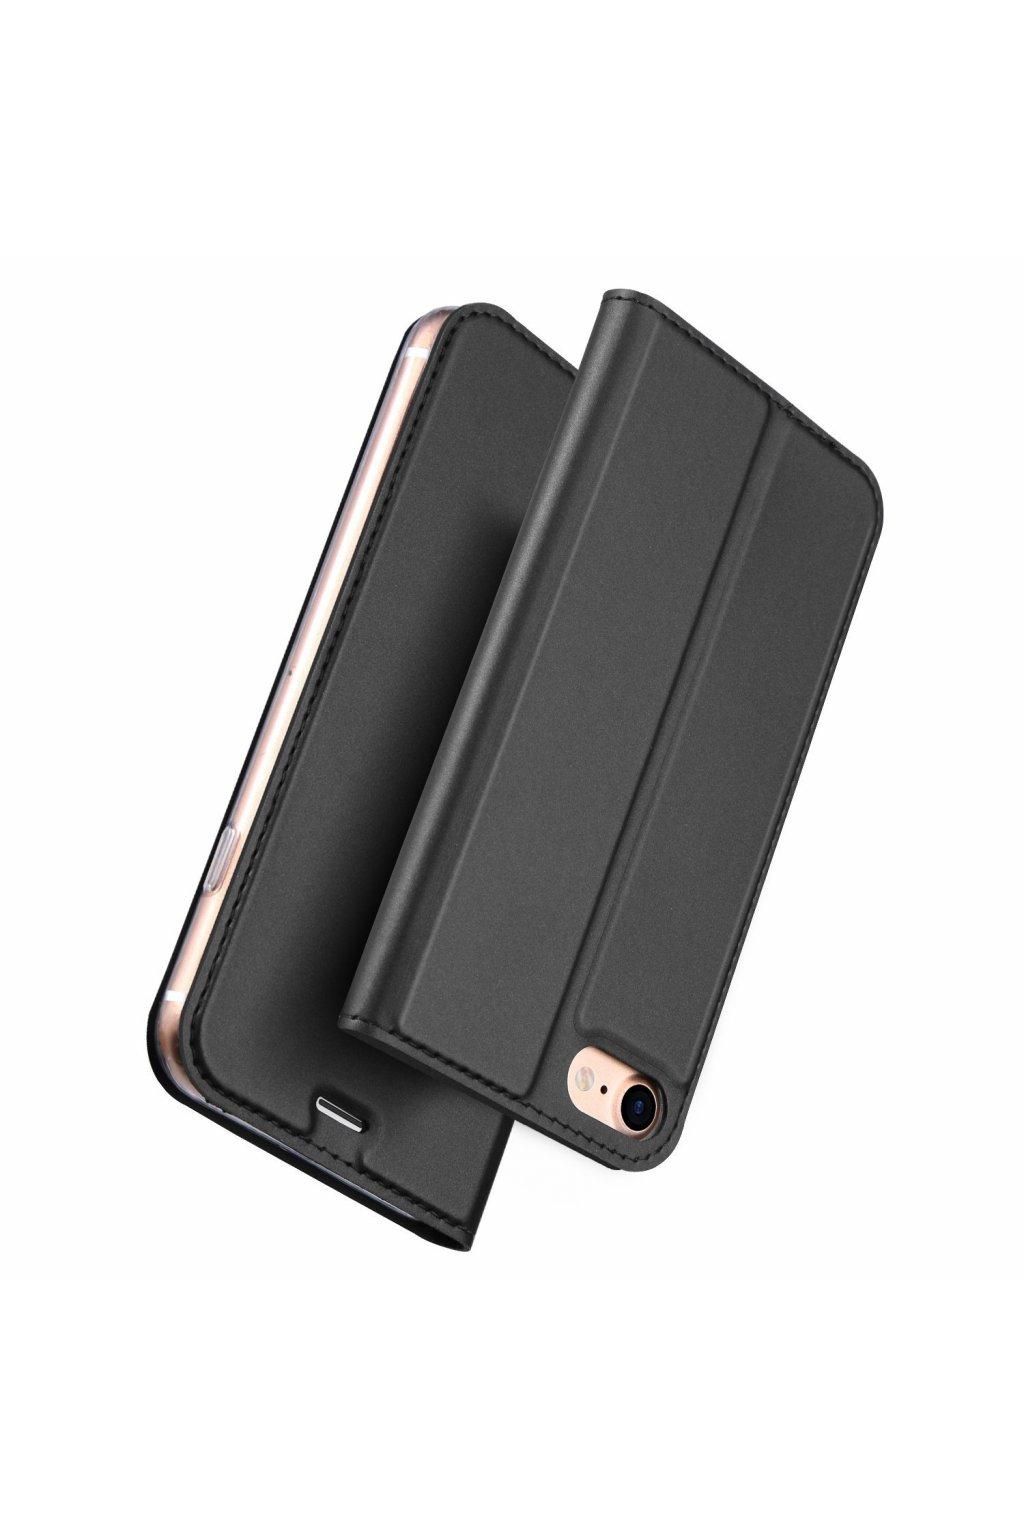 DUX DUCIS Magnetické Skin Book Pouzdro pro iPhone 7/8  Plus Gray